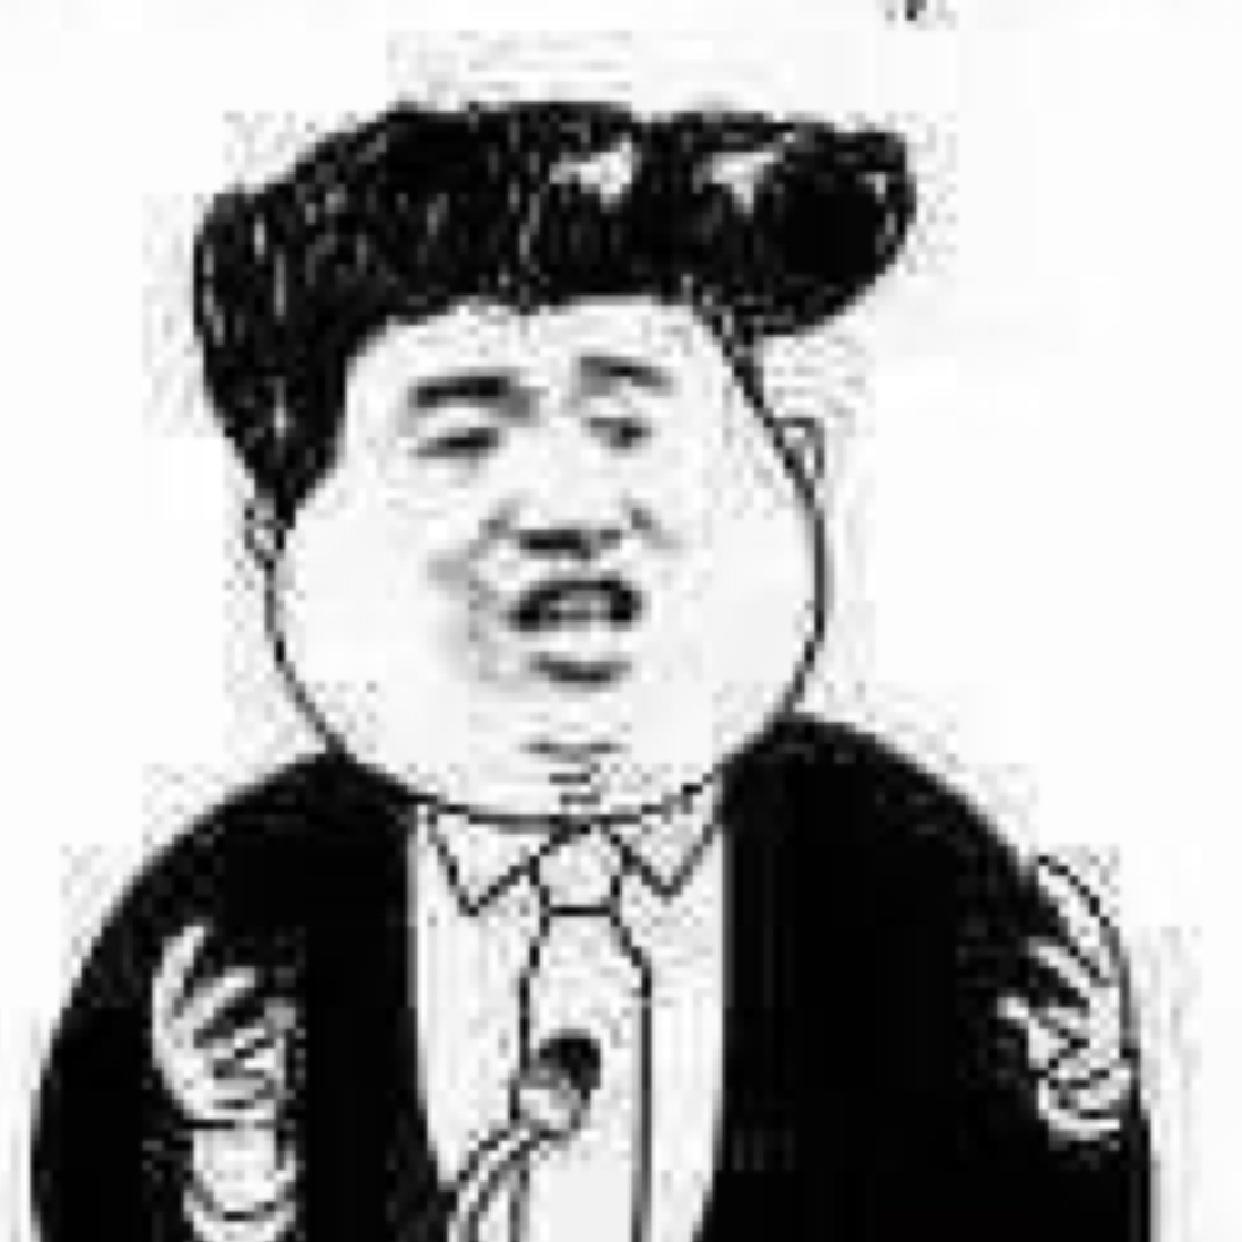 etweixiang